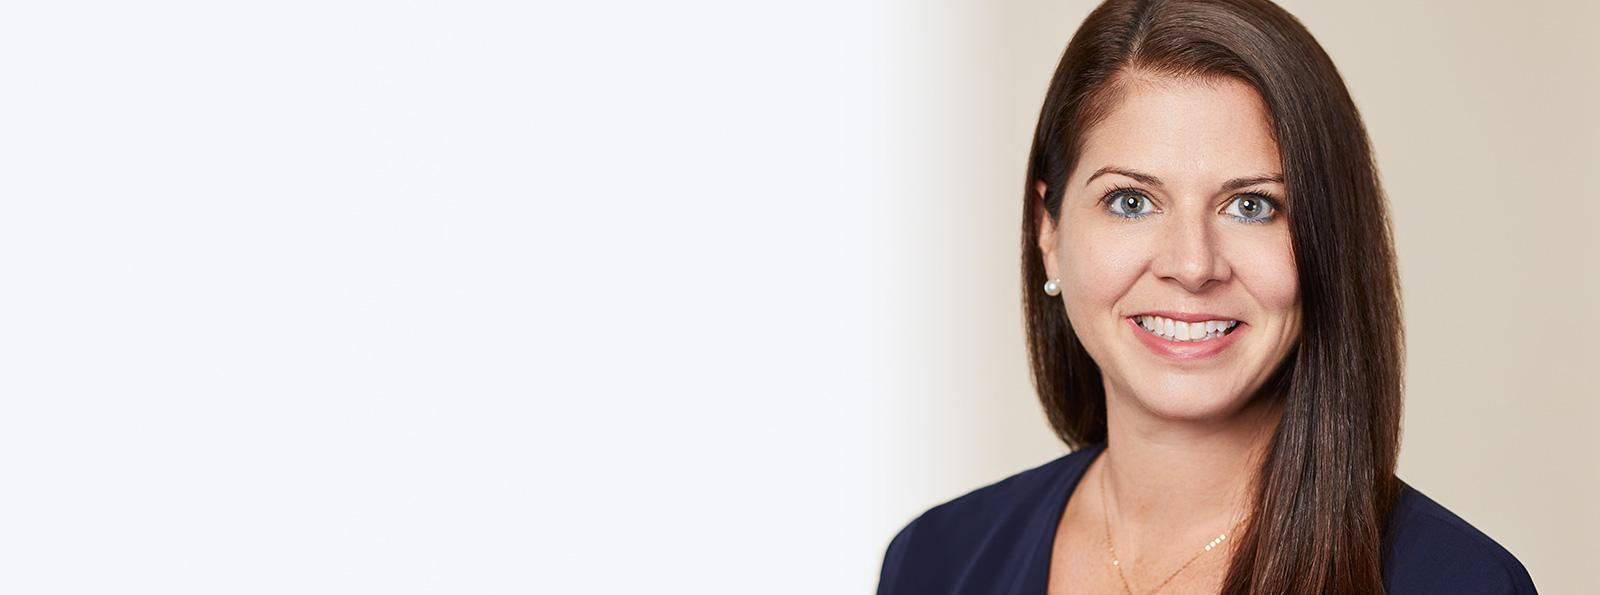 Litigator and mediator Lisa Langevin of Kelly Santini LLP